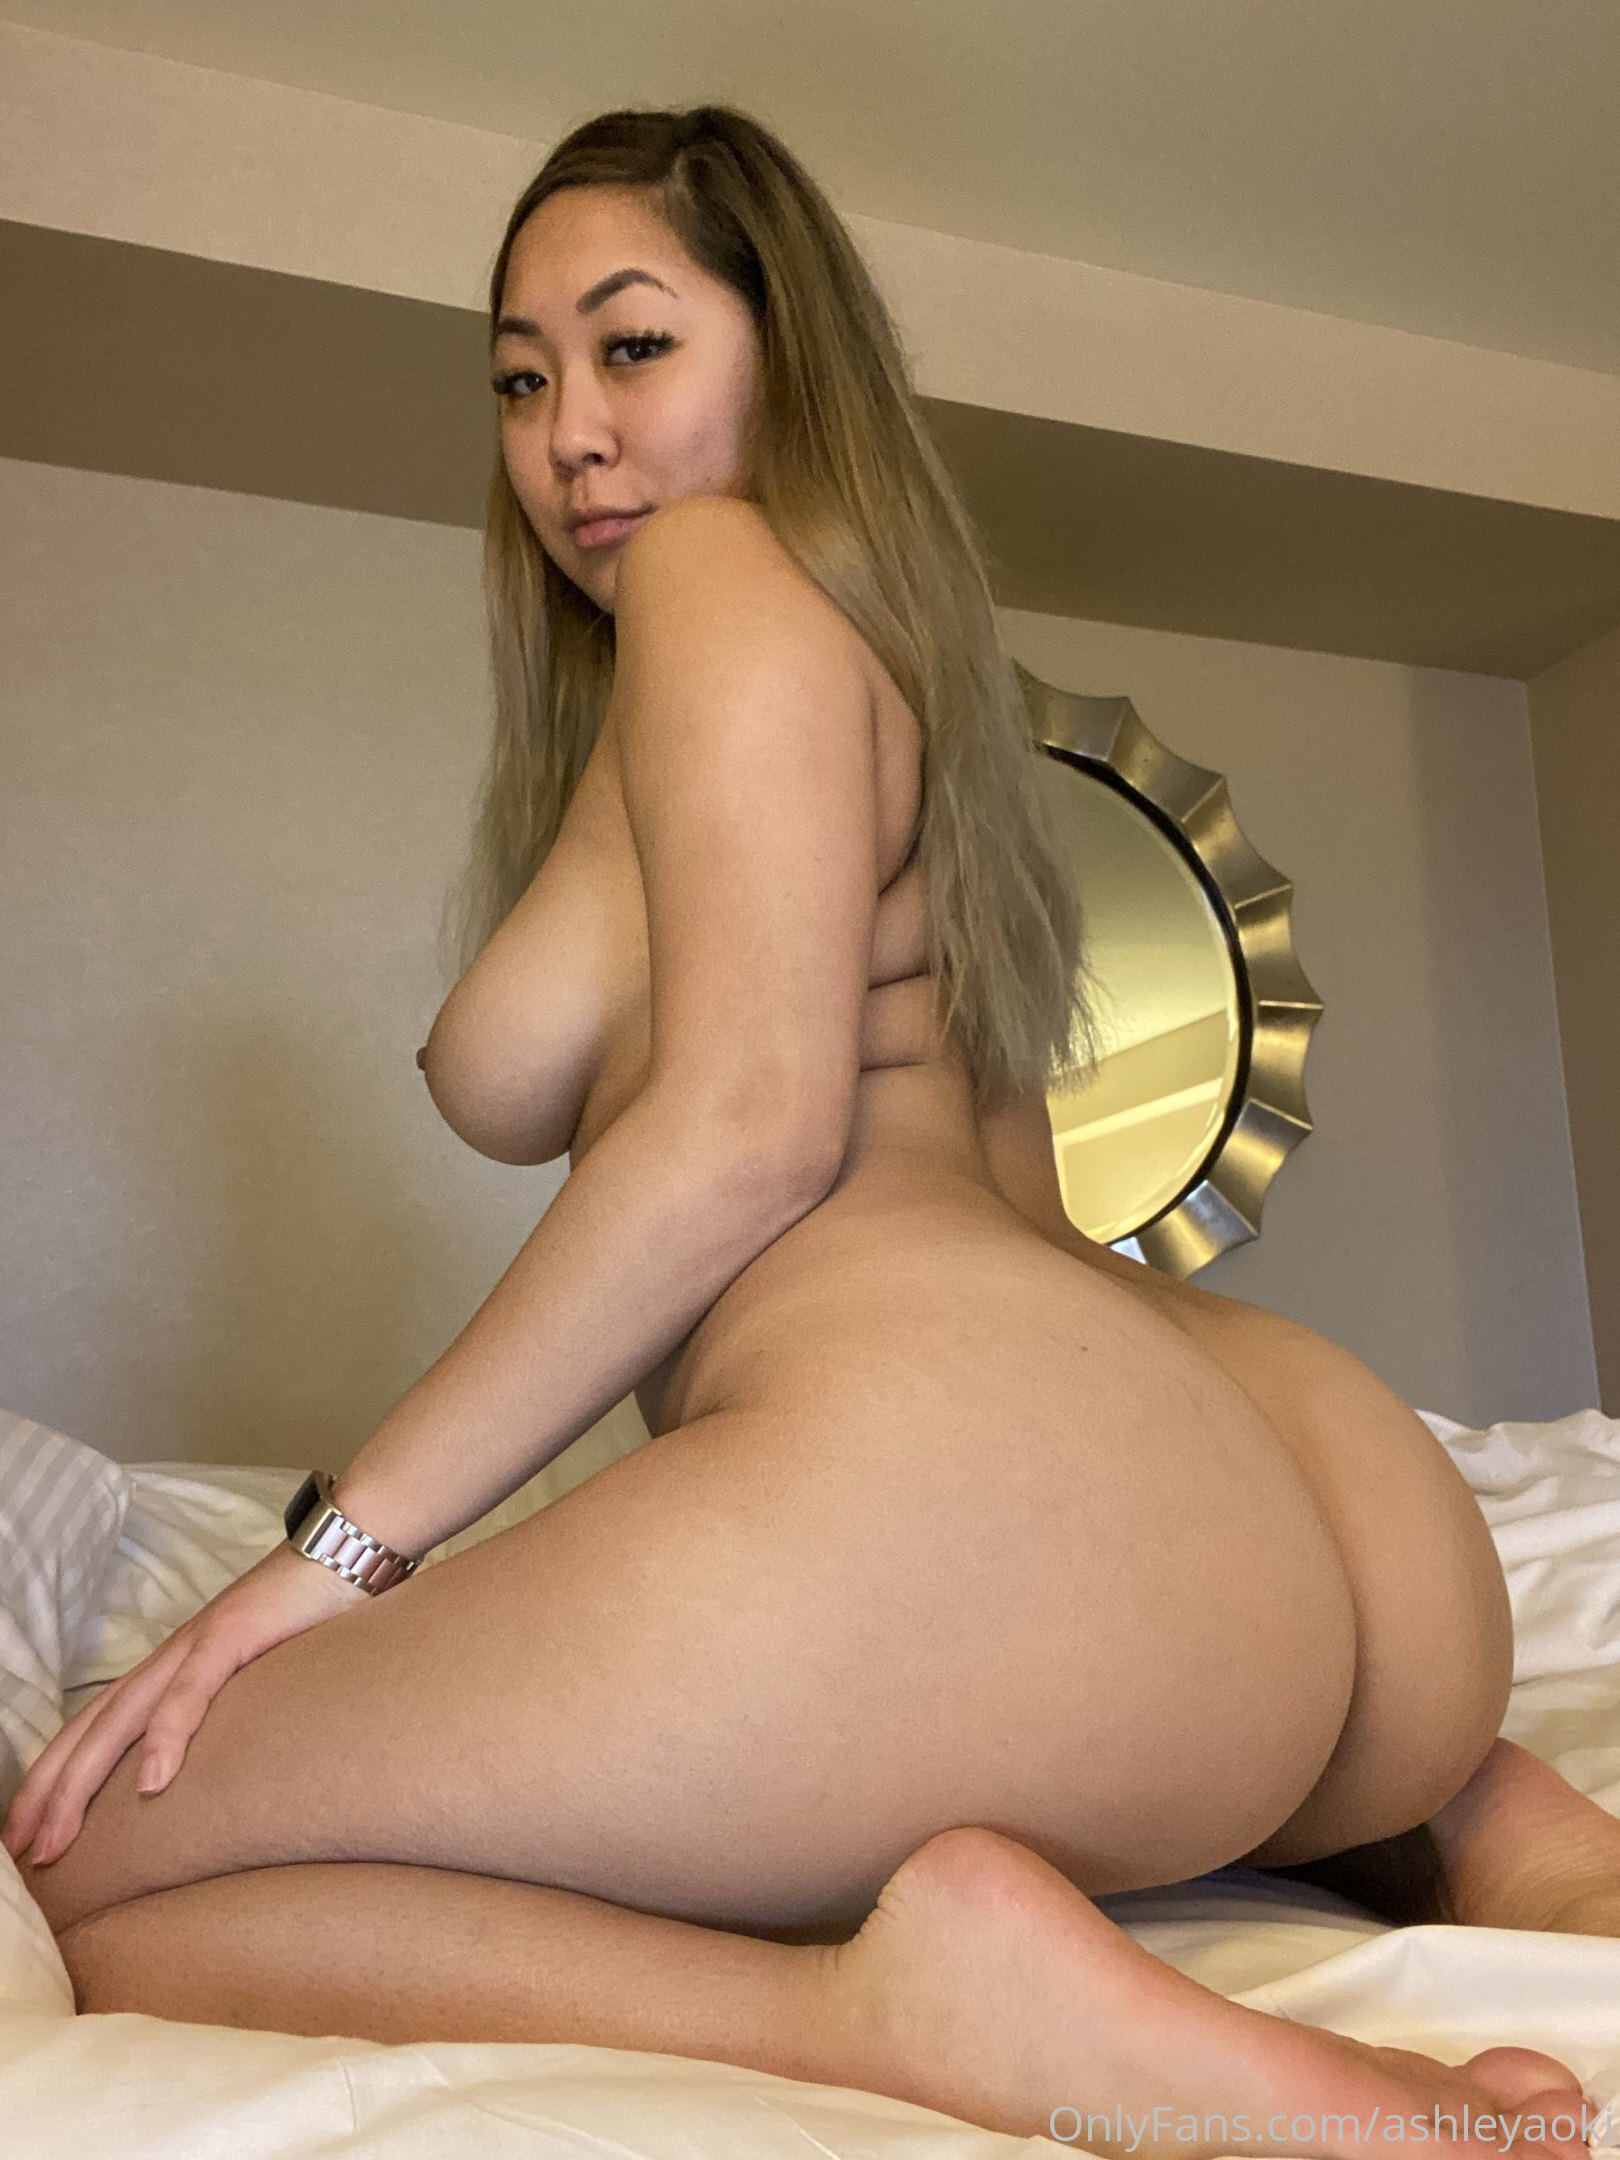 Ashley Aoki, Ashleyaoki, Onlyfans Leaks 0258